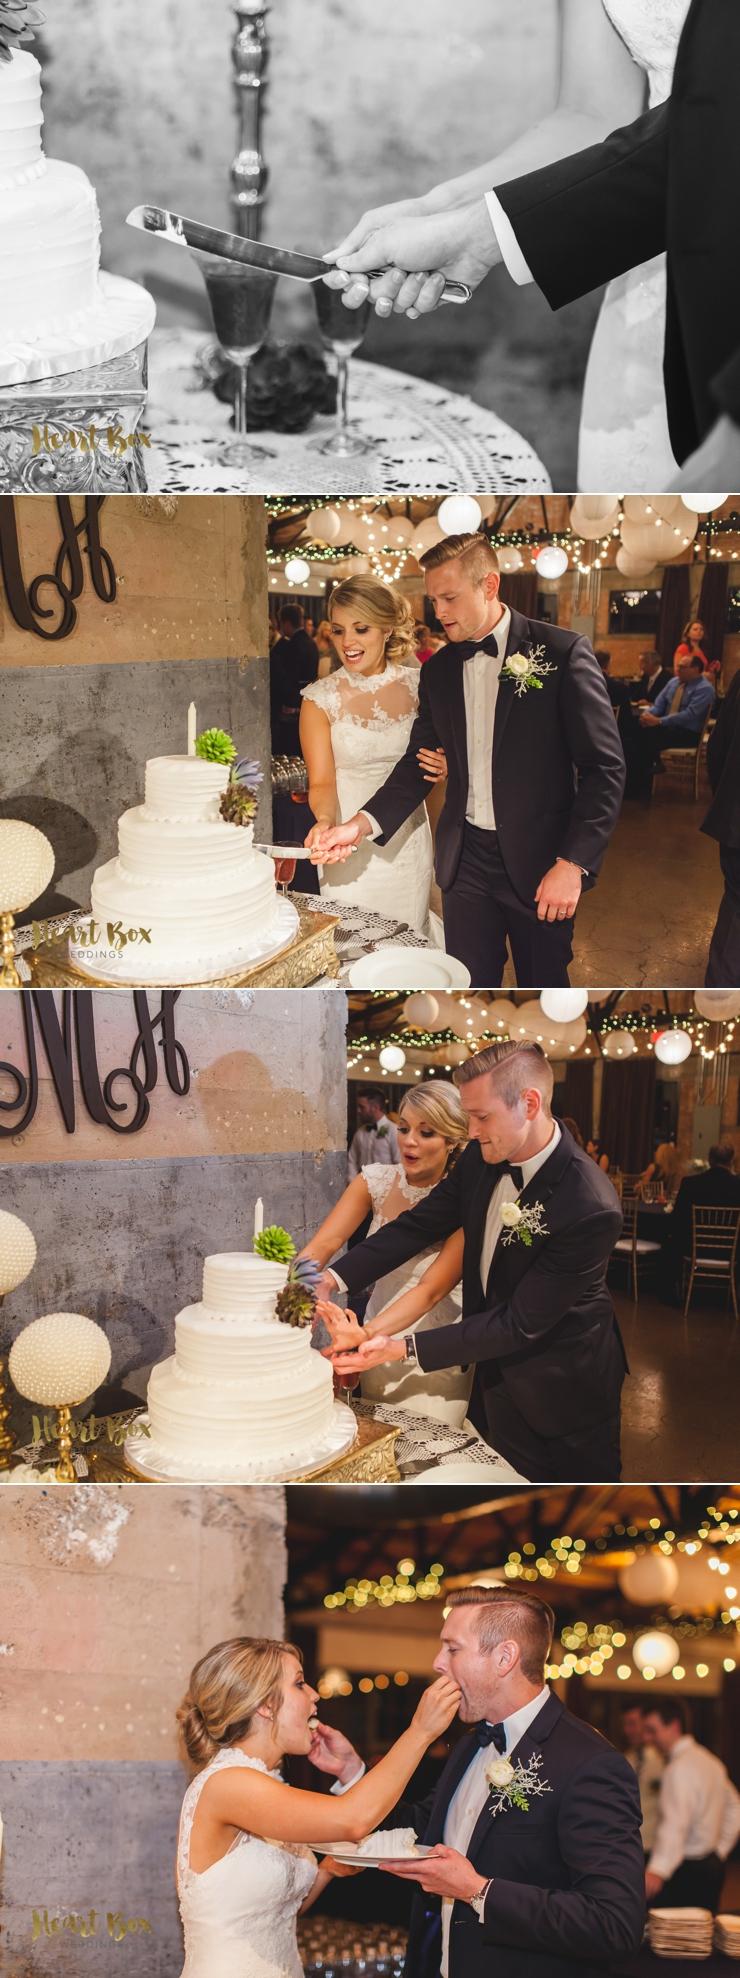 Mabry Wedding 26.jpg